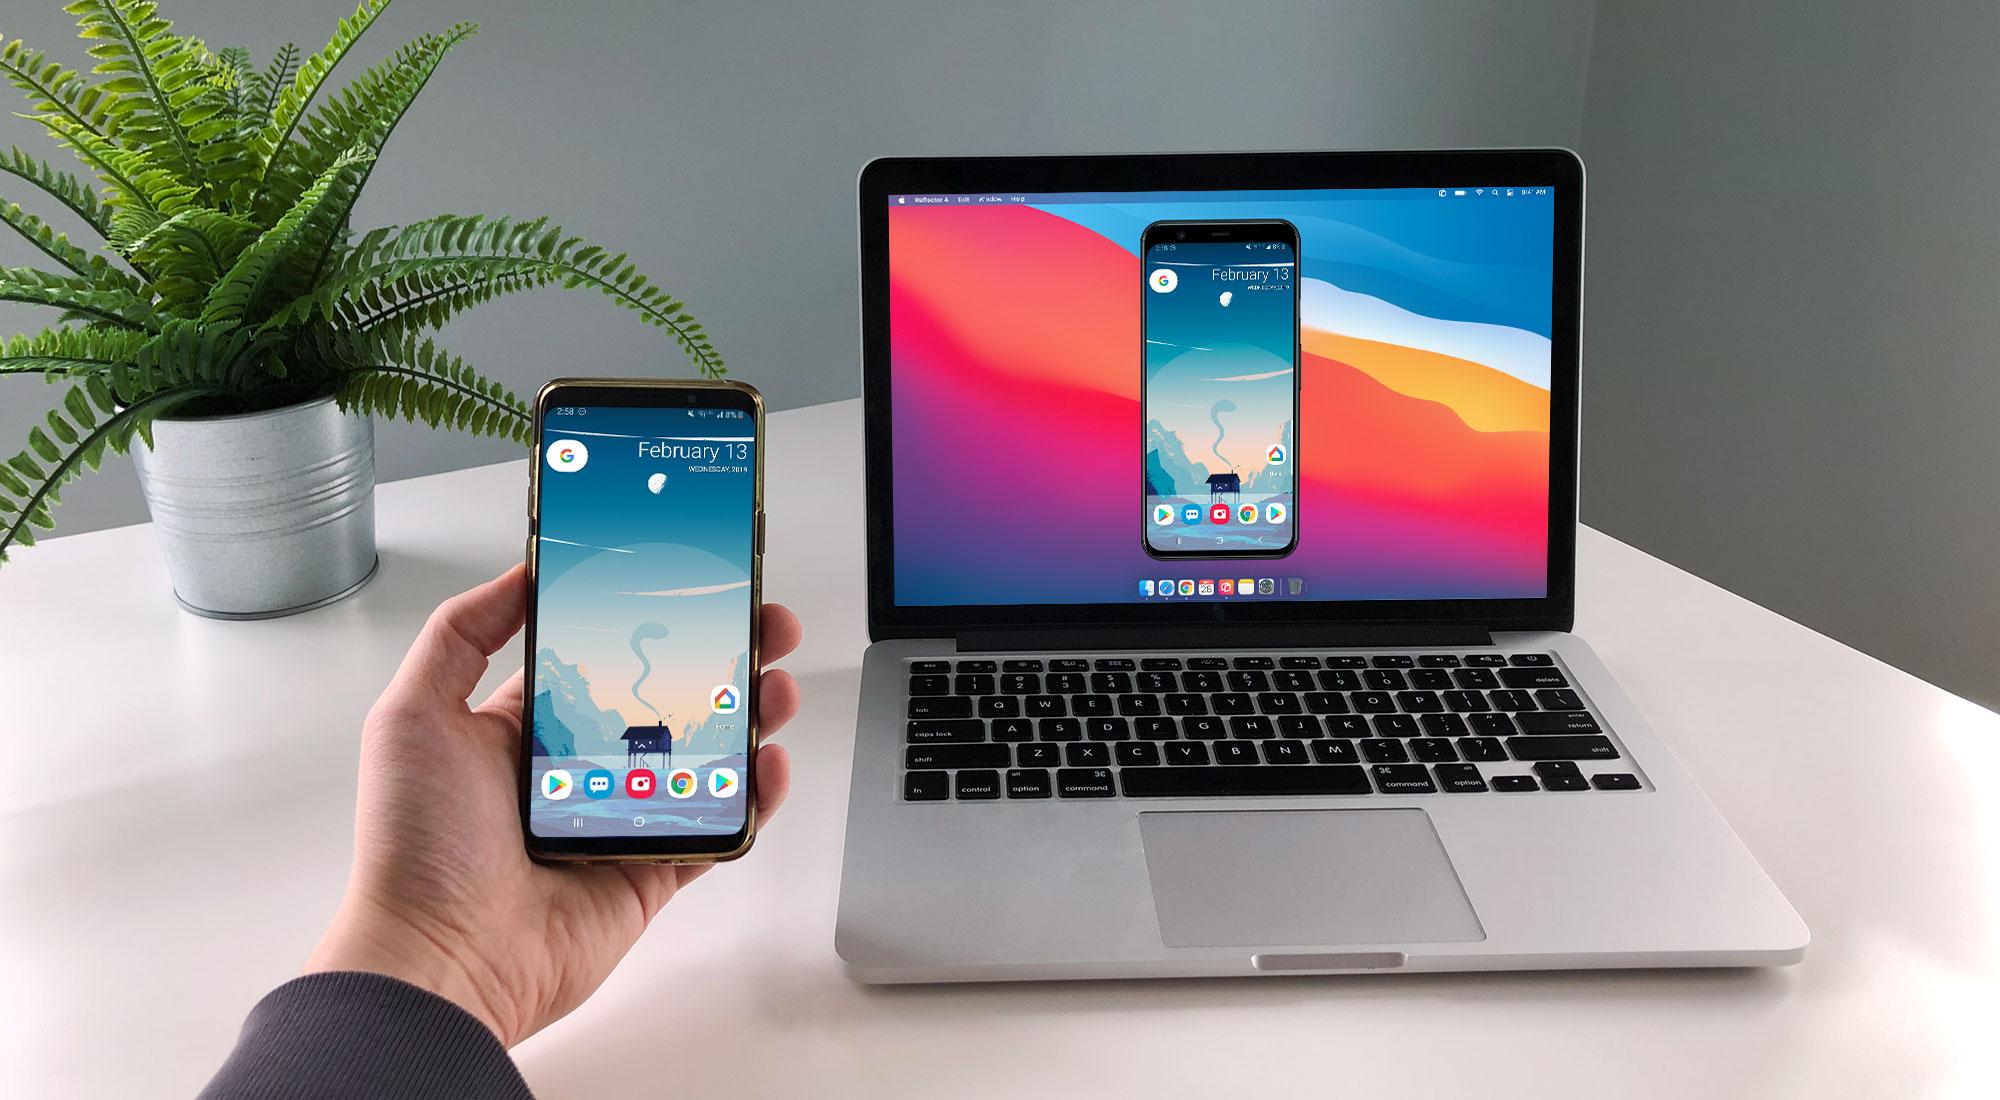 Samsung phone mirroring to computer